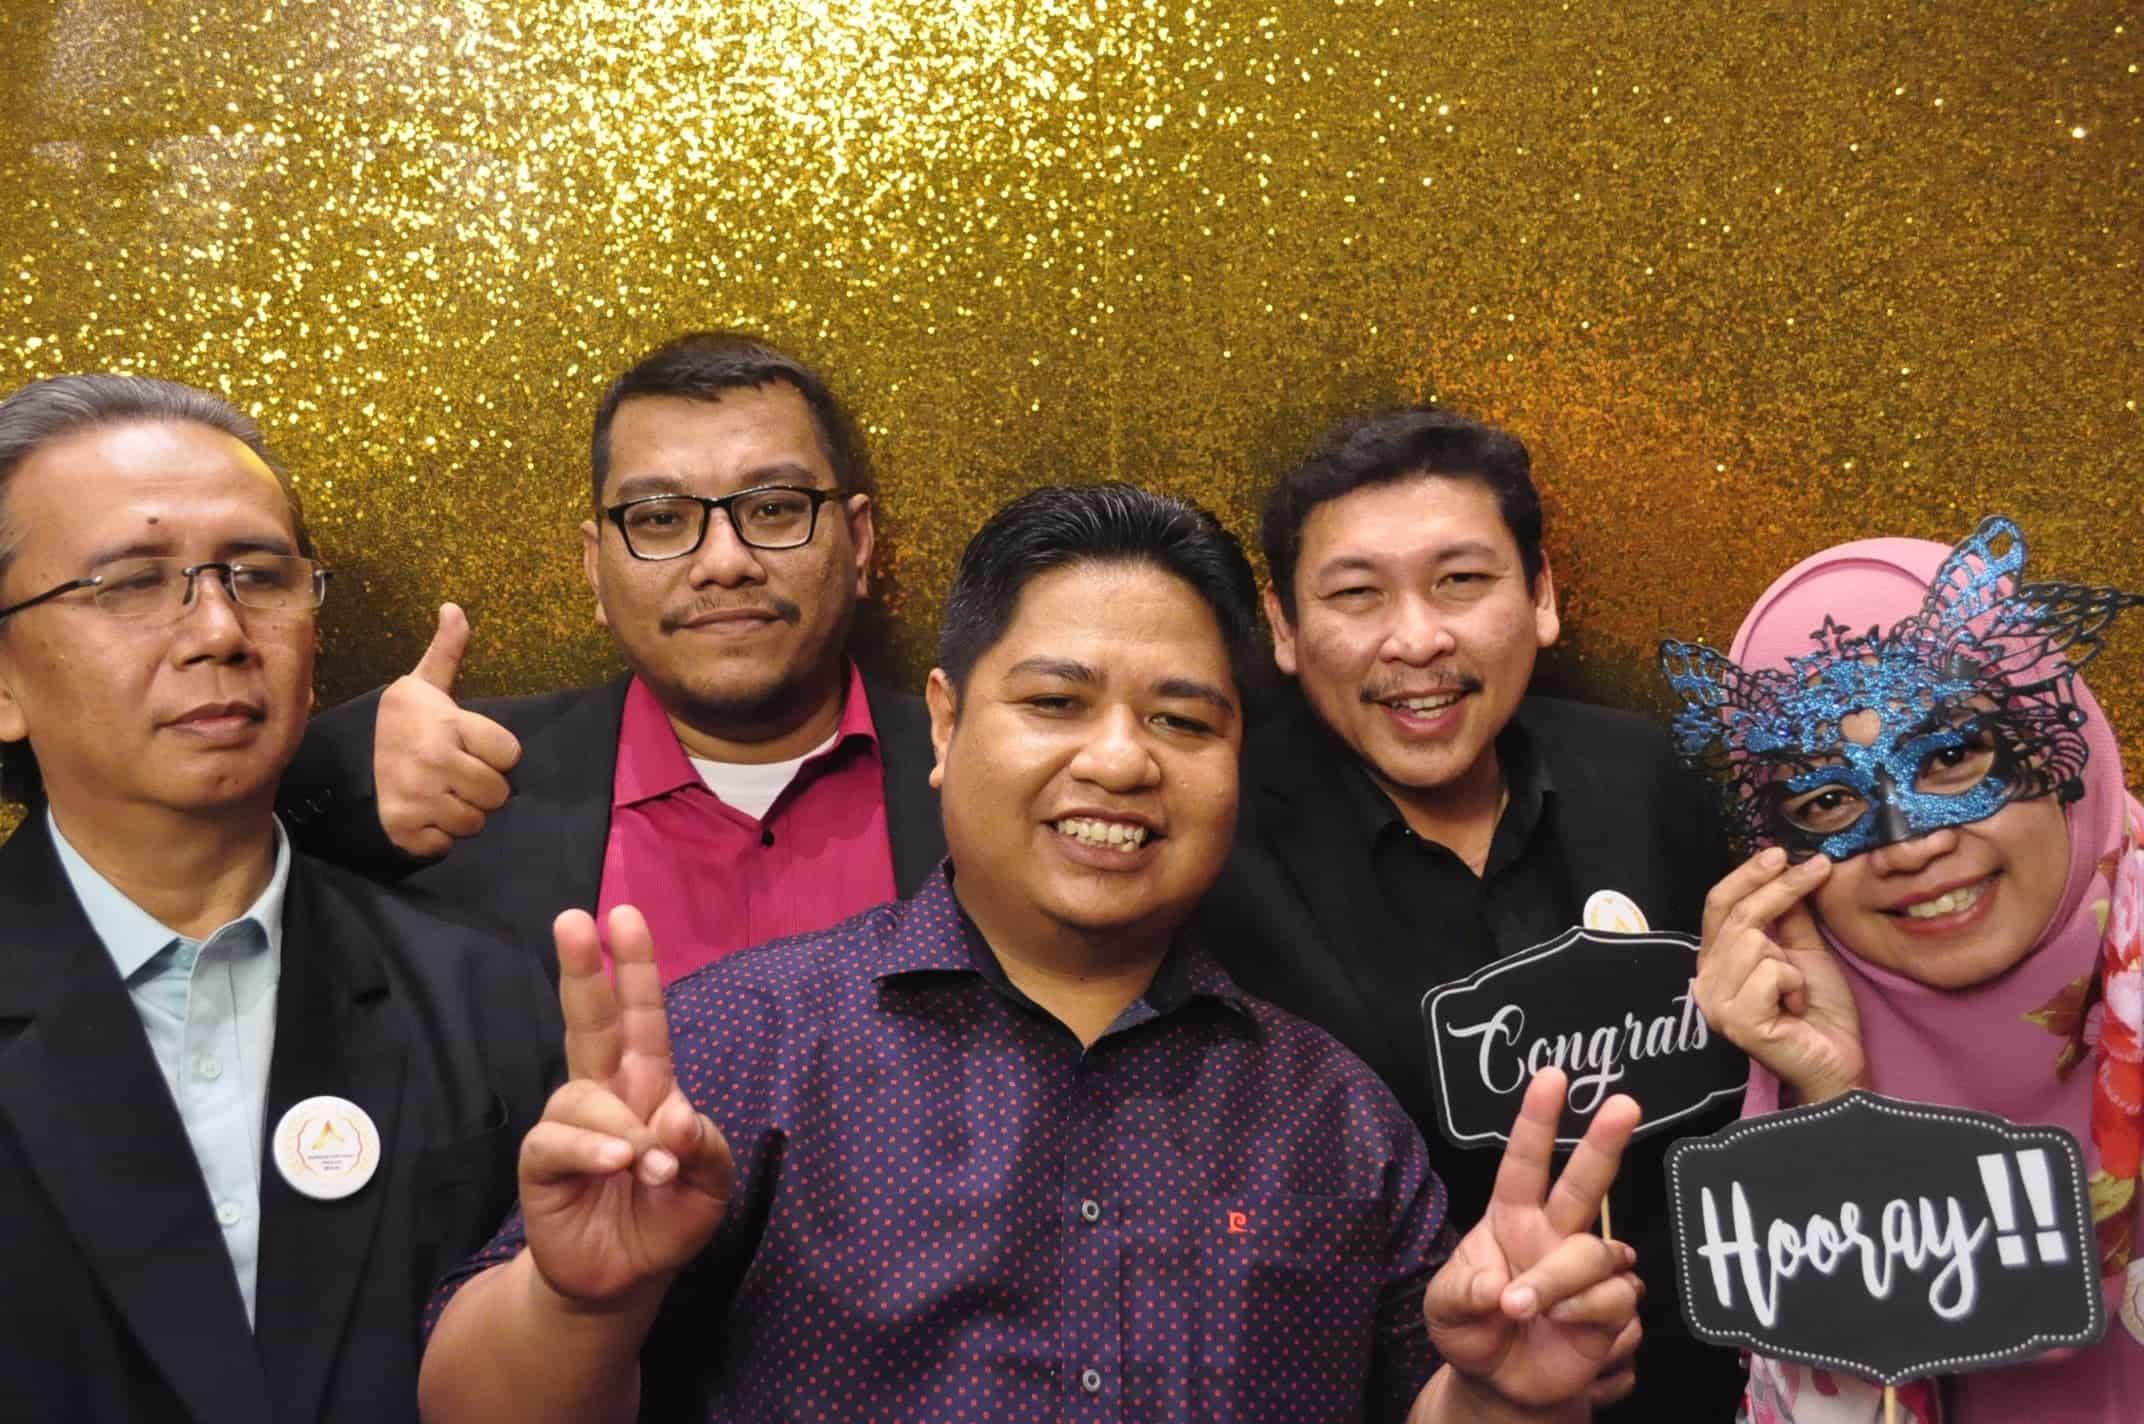 Malam Gala Anggun 2018 (Photobooth) 23